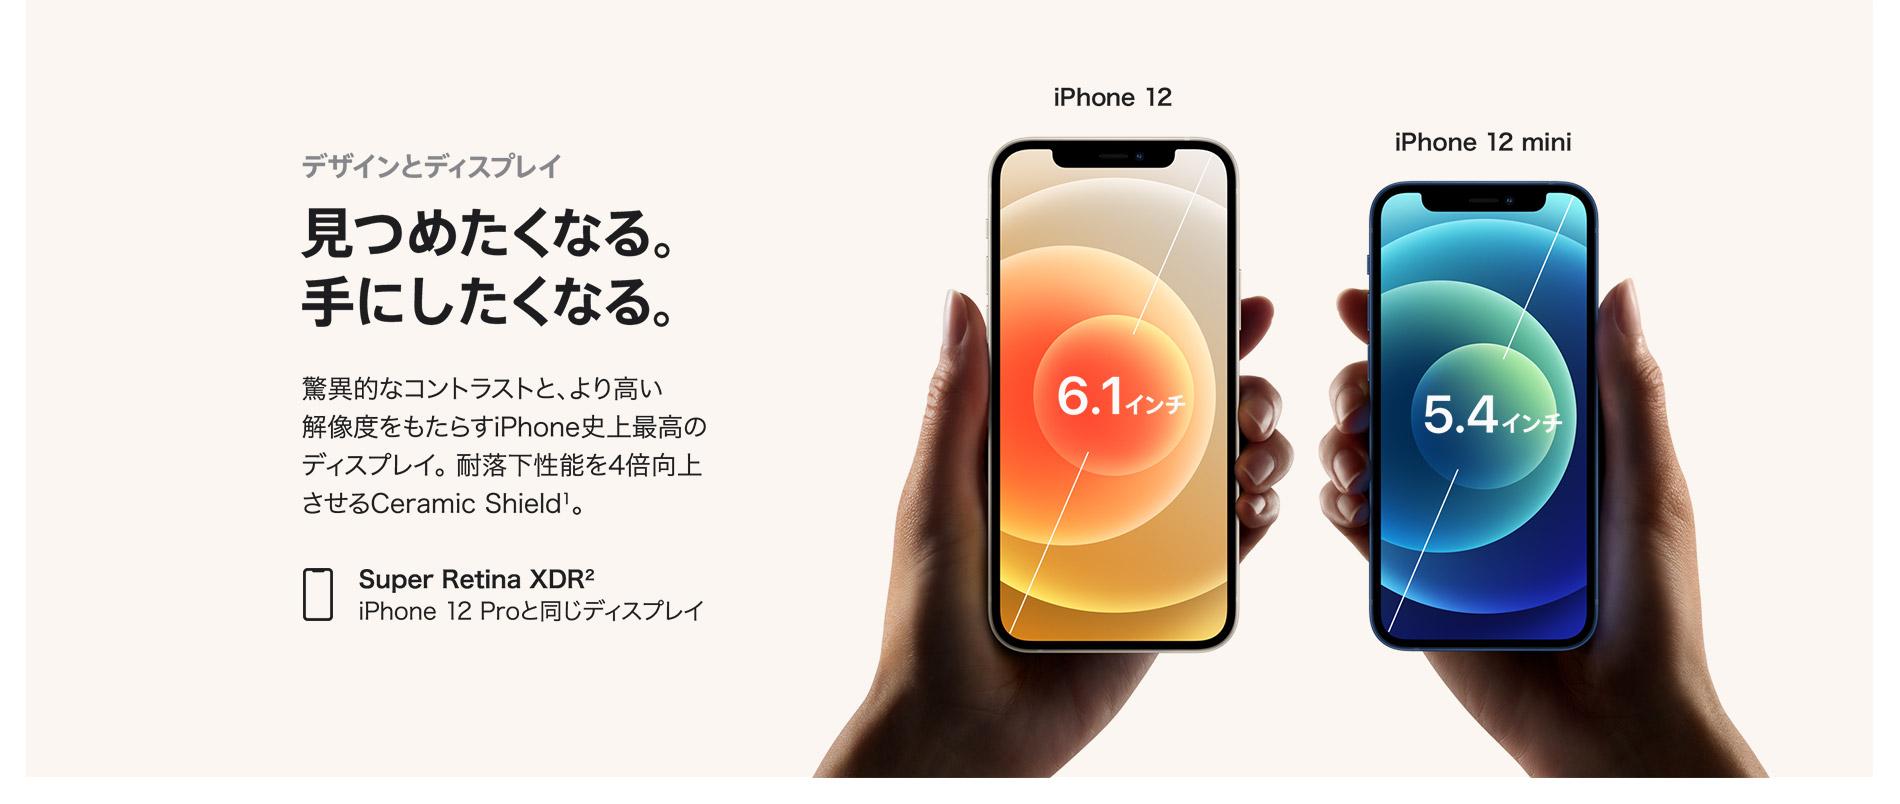 iPhone12 mini